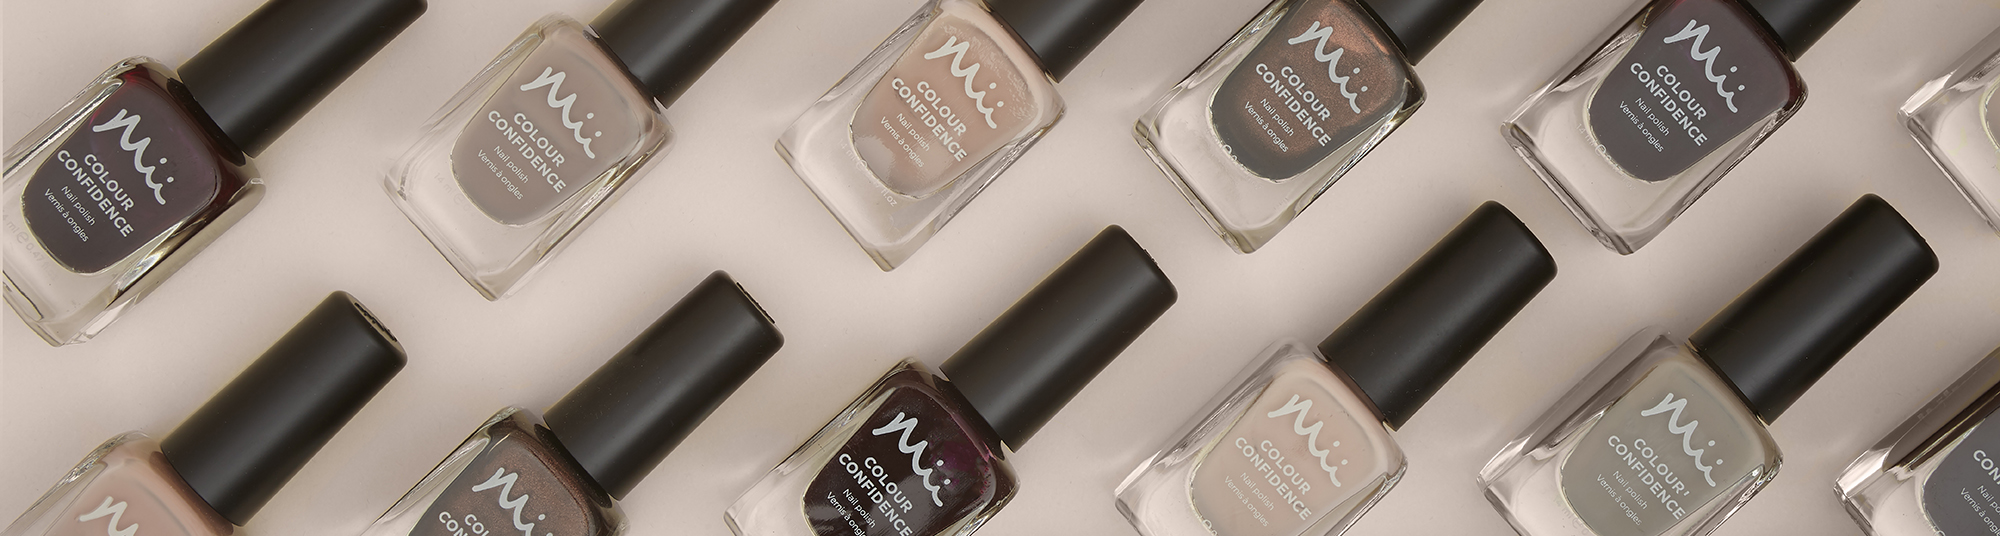 Mii Mii Colour Confidence Nail Polish Browns Category